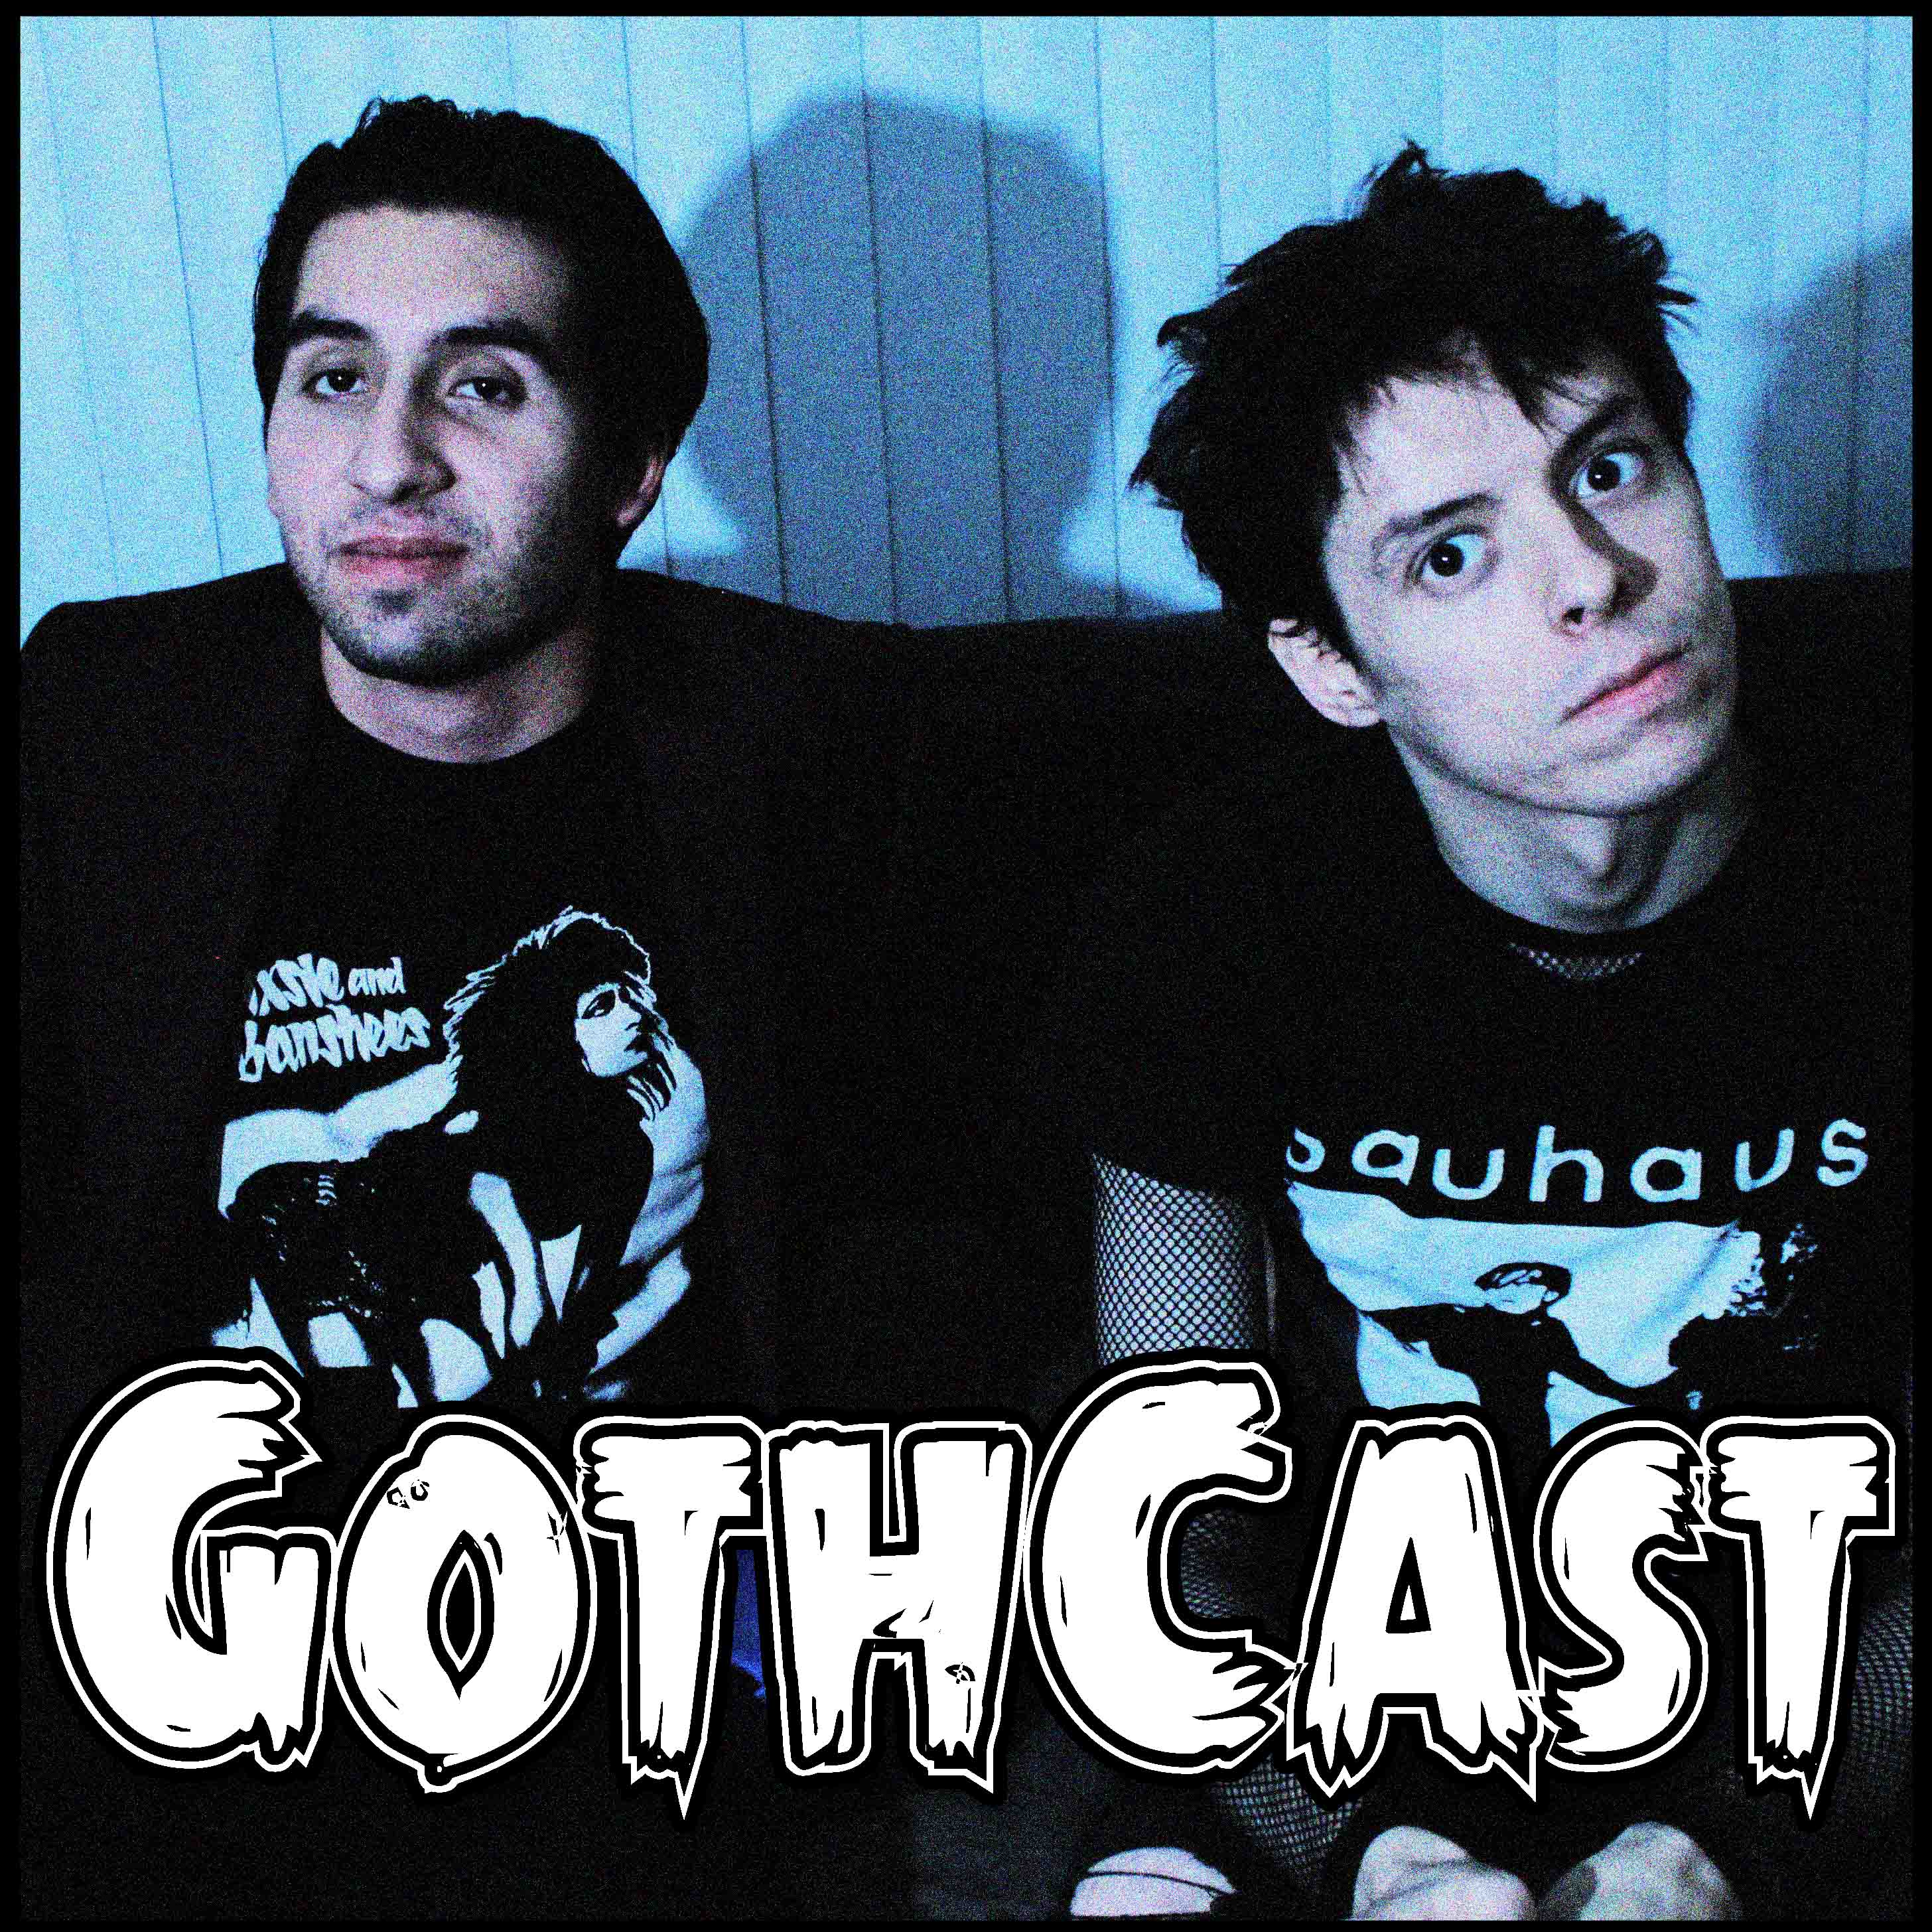 GothCast